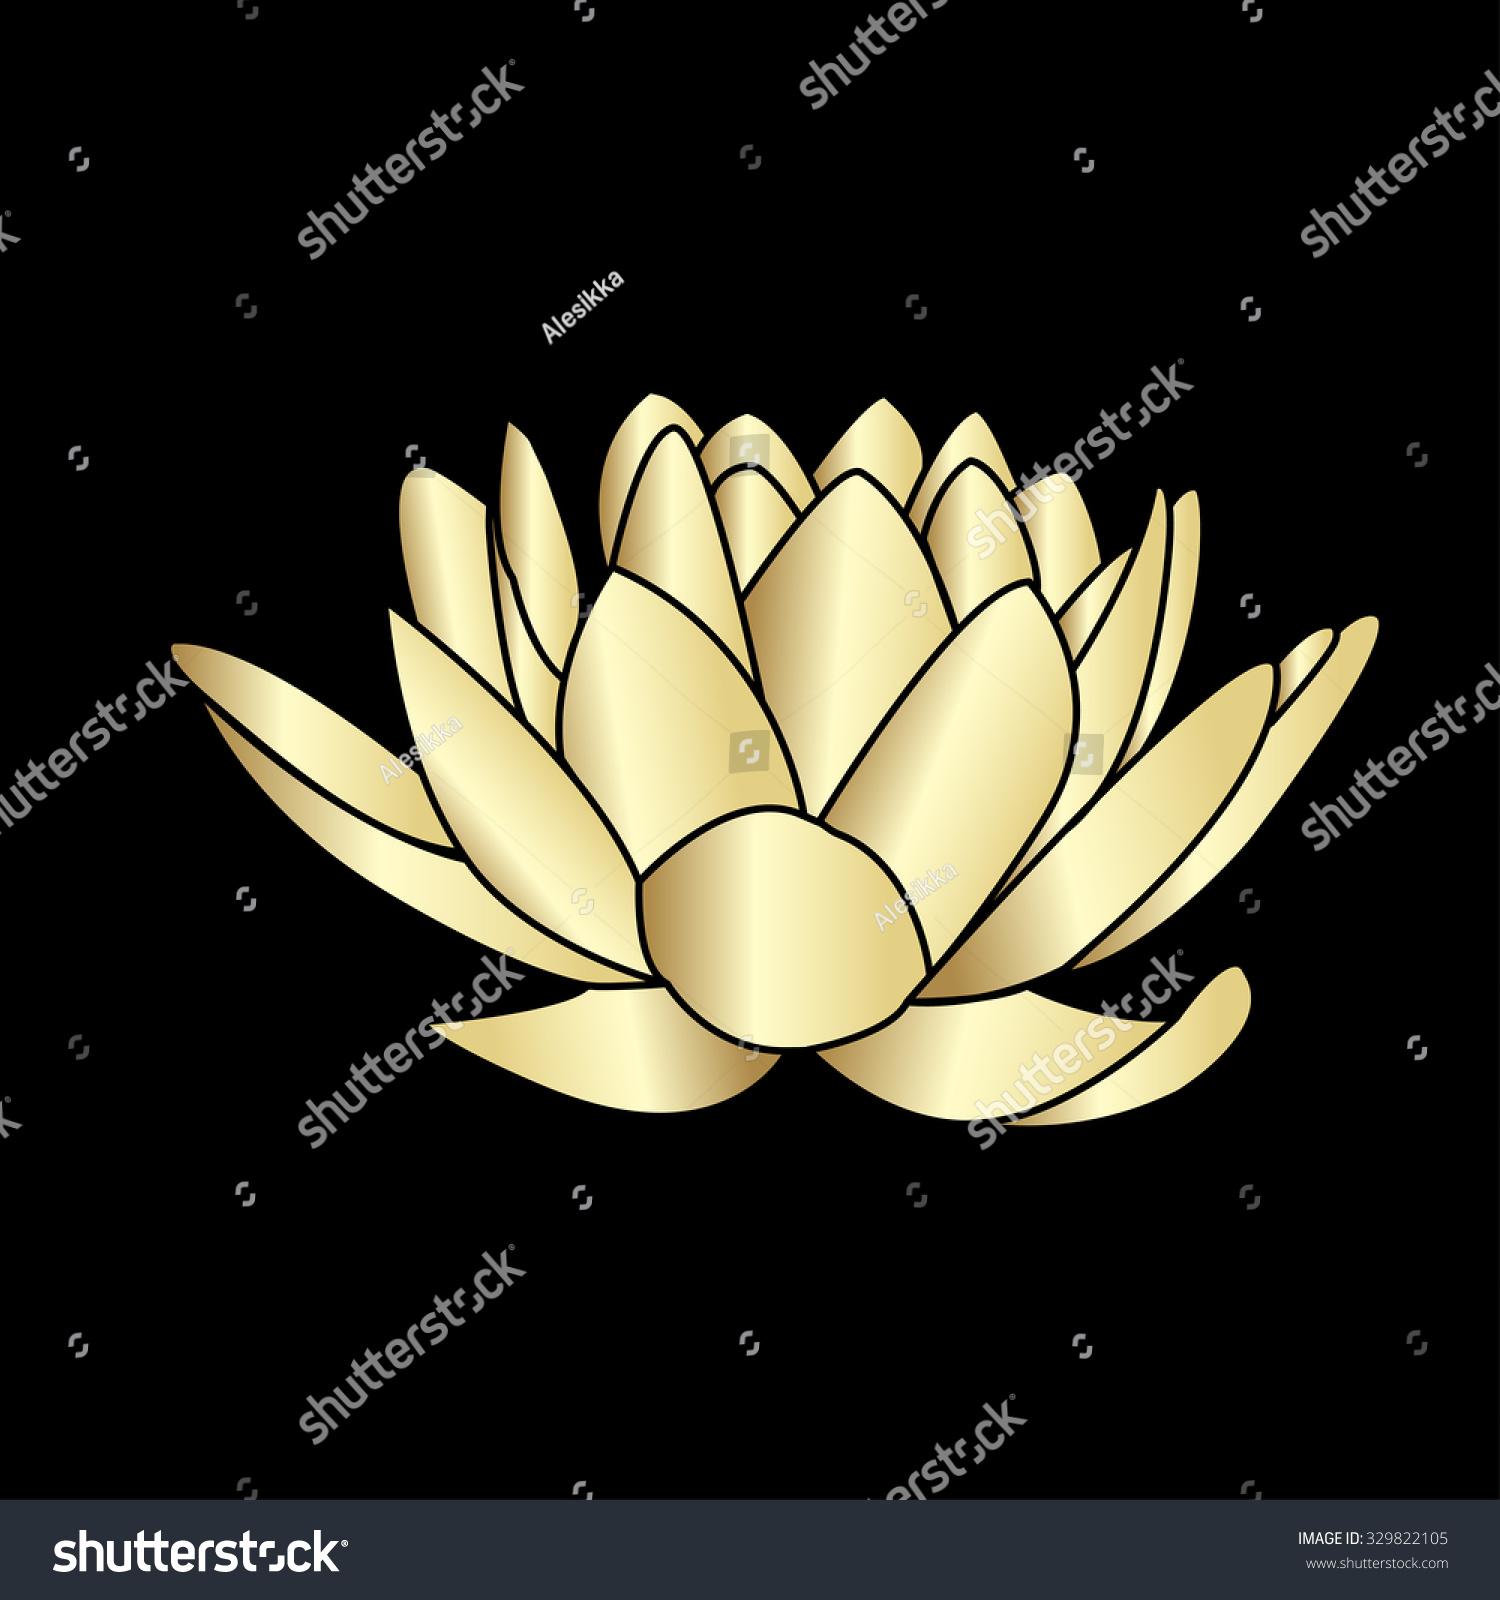 Golden silhouette lotus flowers icon on stock vector 329822105 golden silhouette of lotus flowers icon on a black background izmirmasajfo